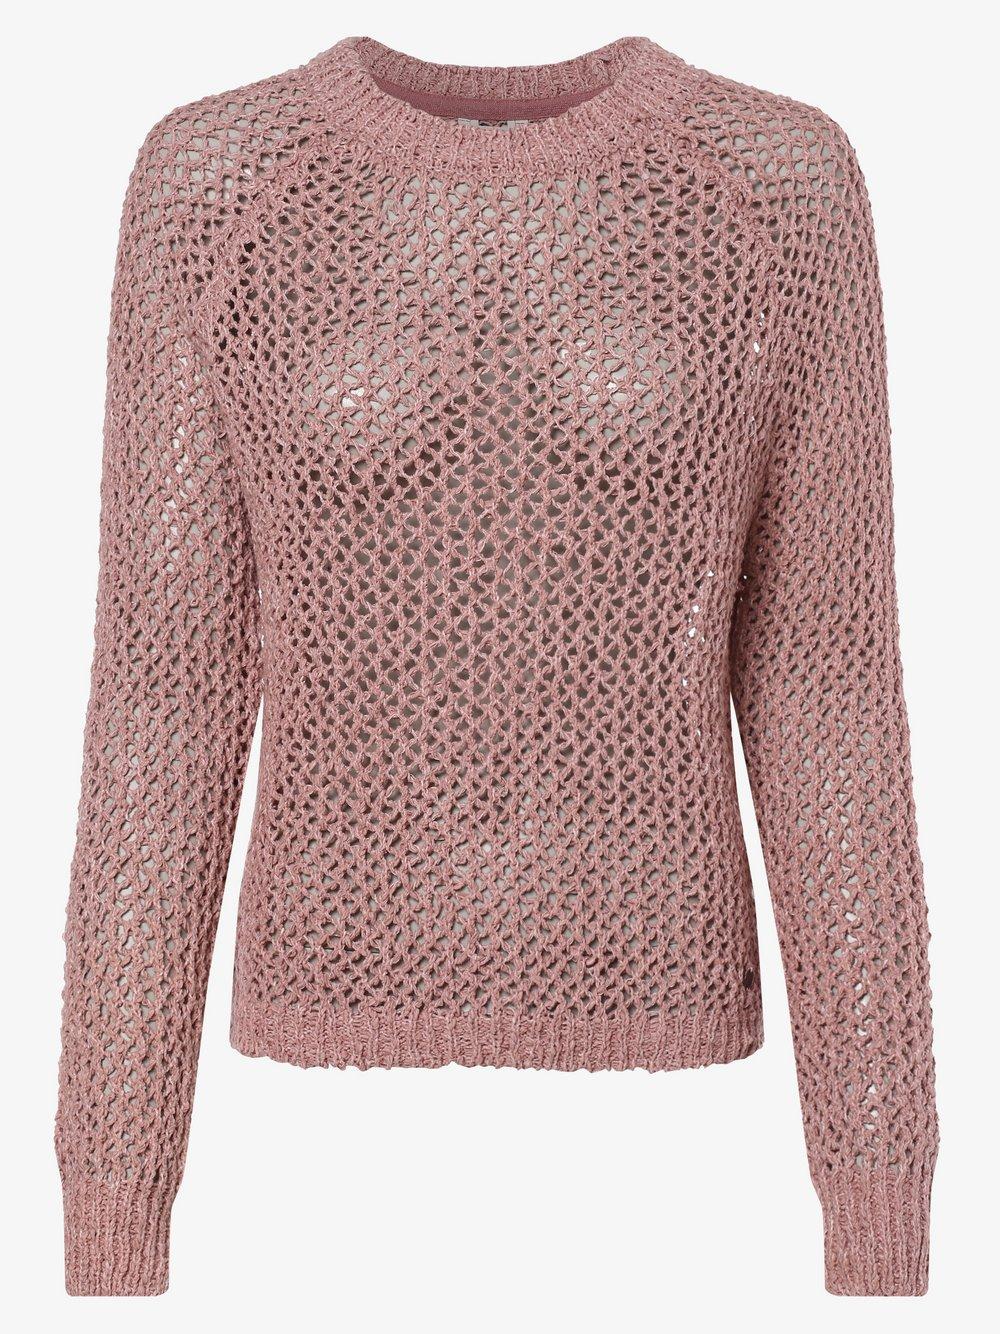 Pepe Jeans - Sweter damski – Elle, różowy